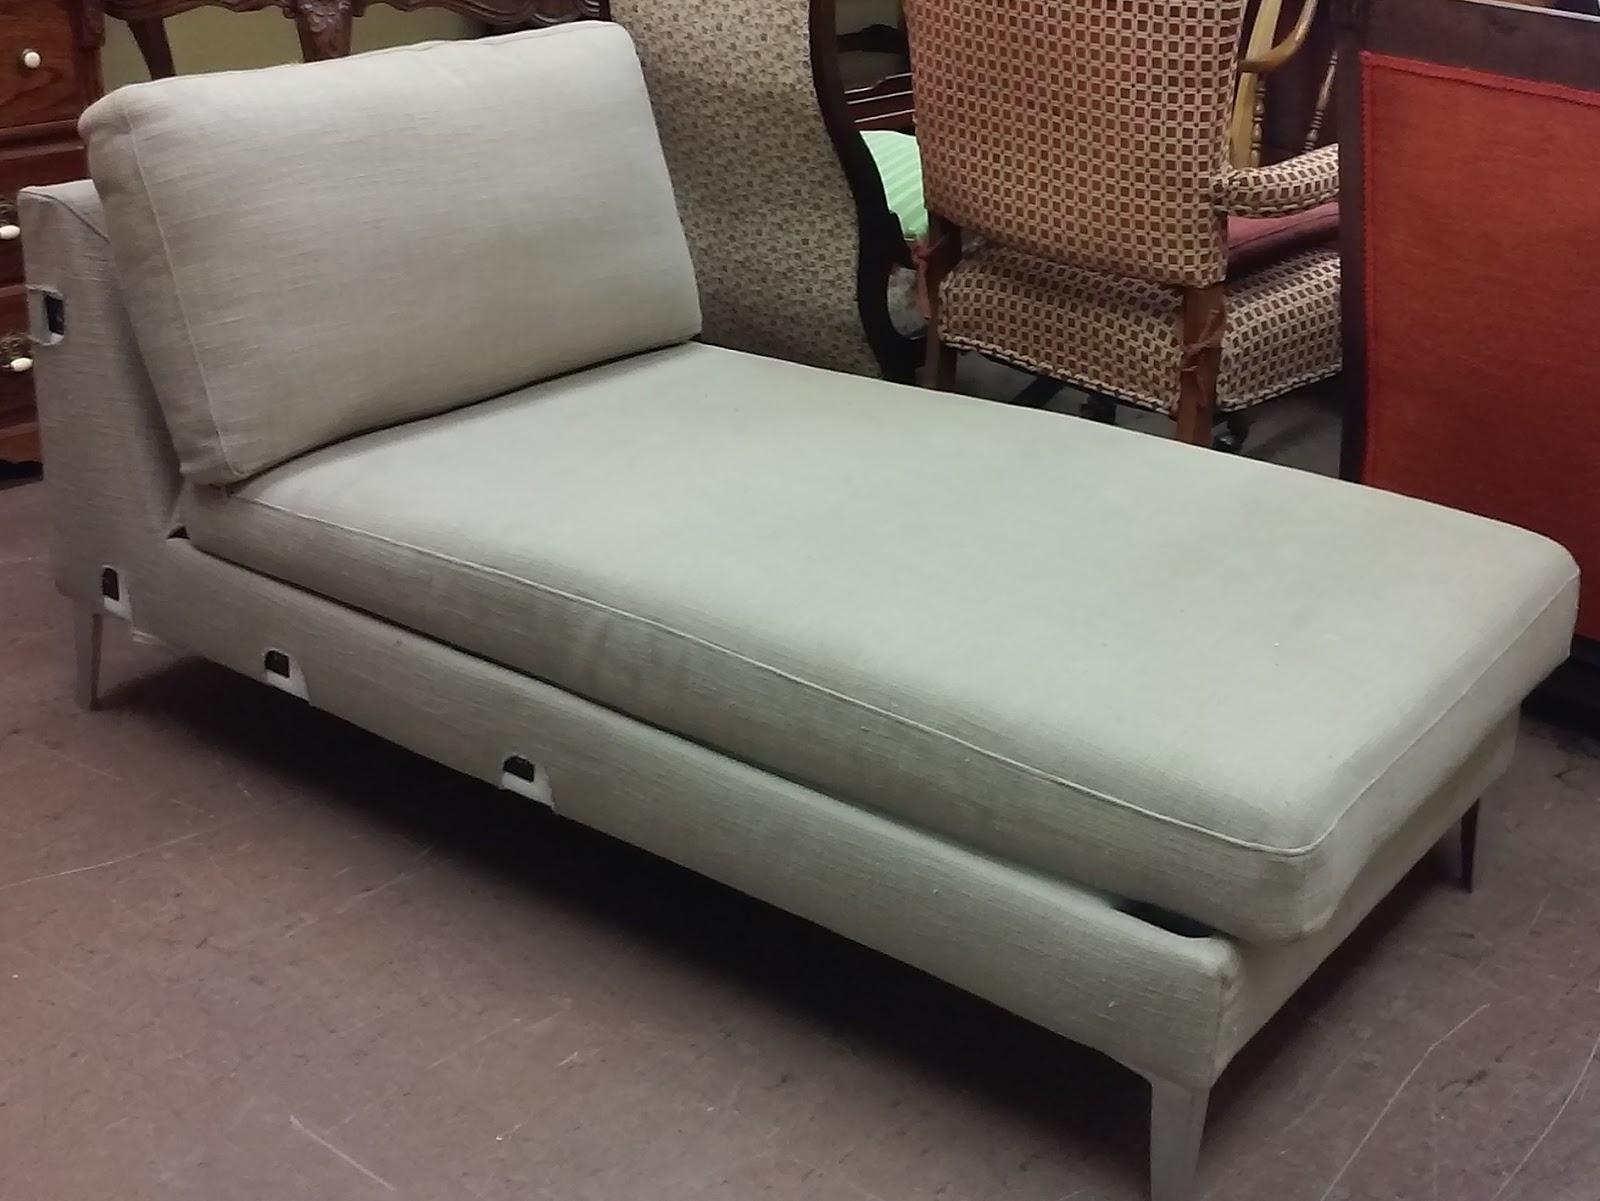 UHURU FURNITURE & COLLECTIBLES SOLD Beige IKEA Chaise Lounge $25